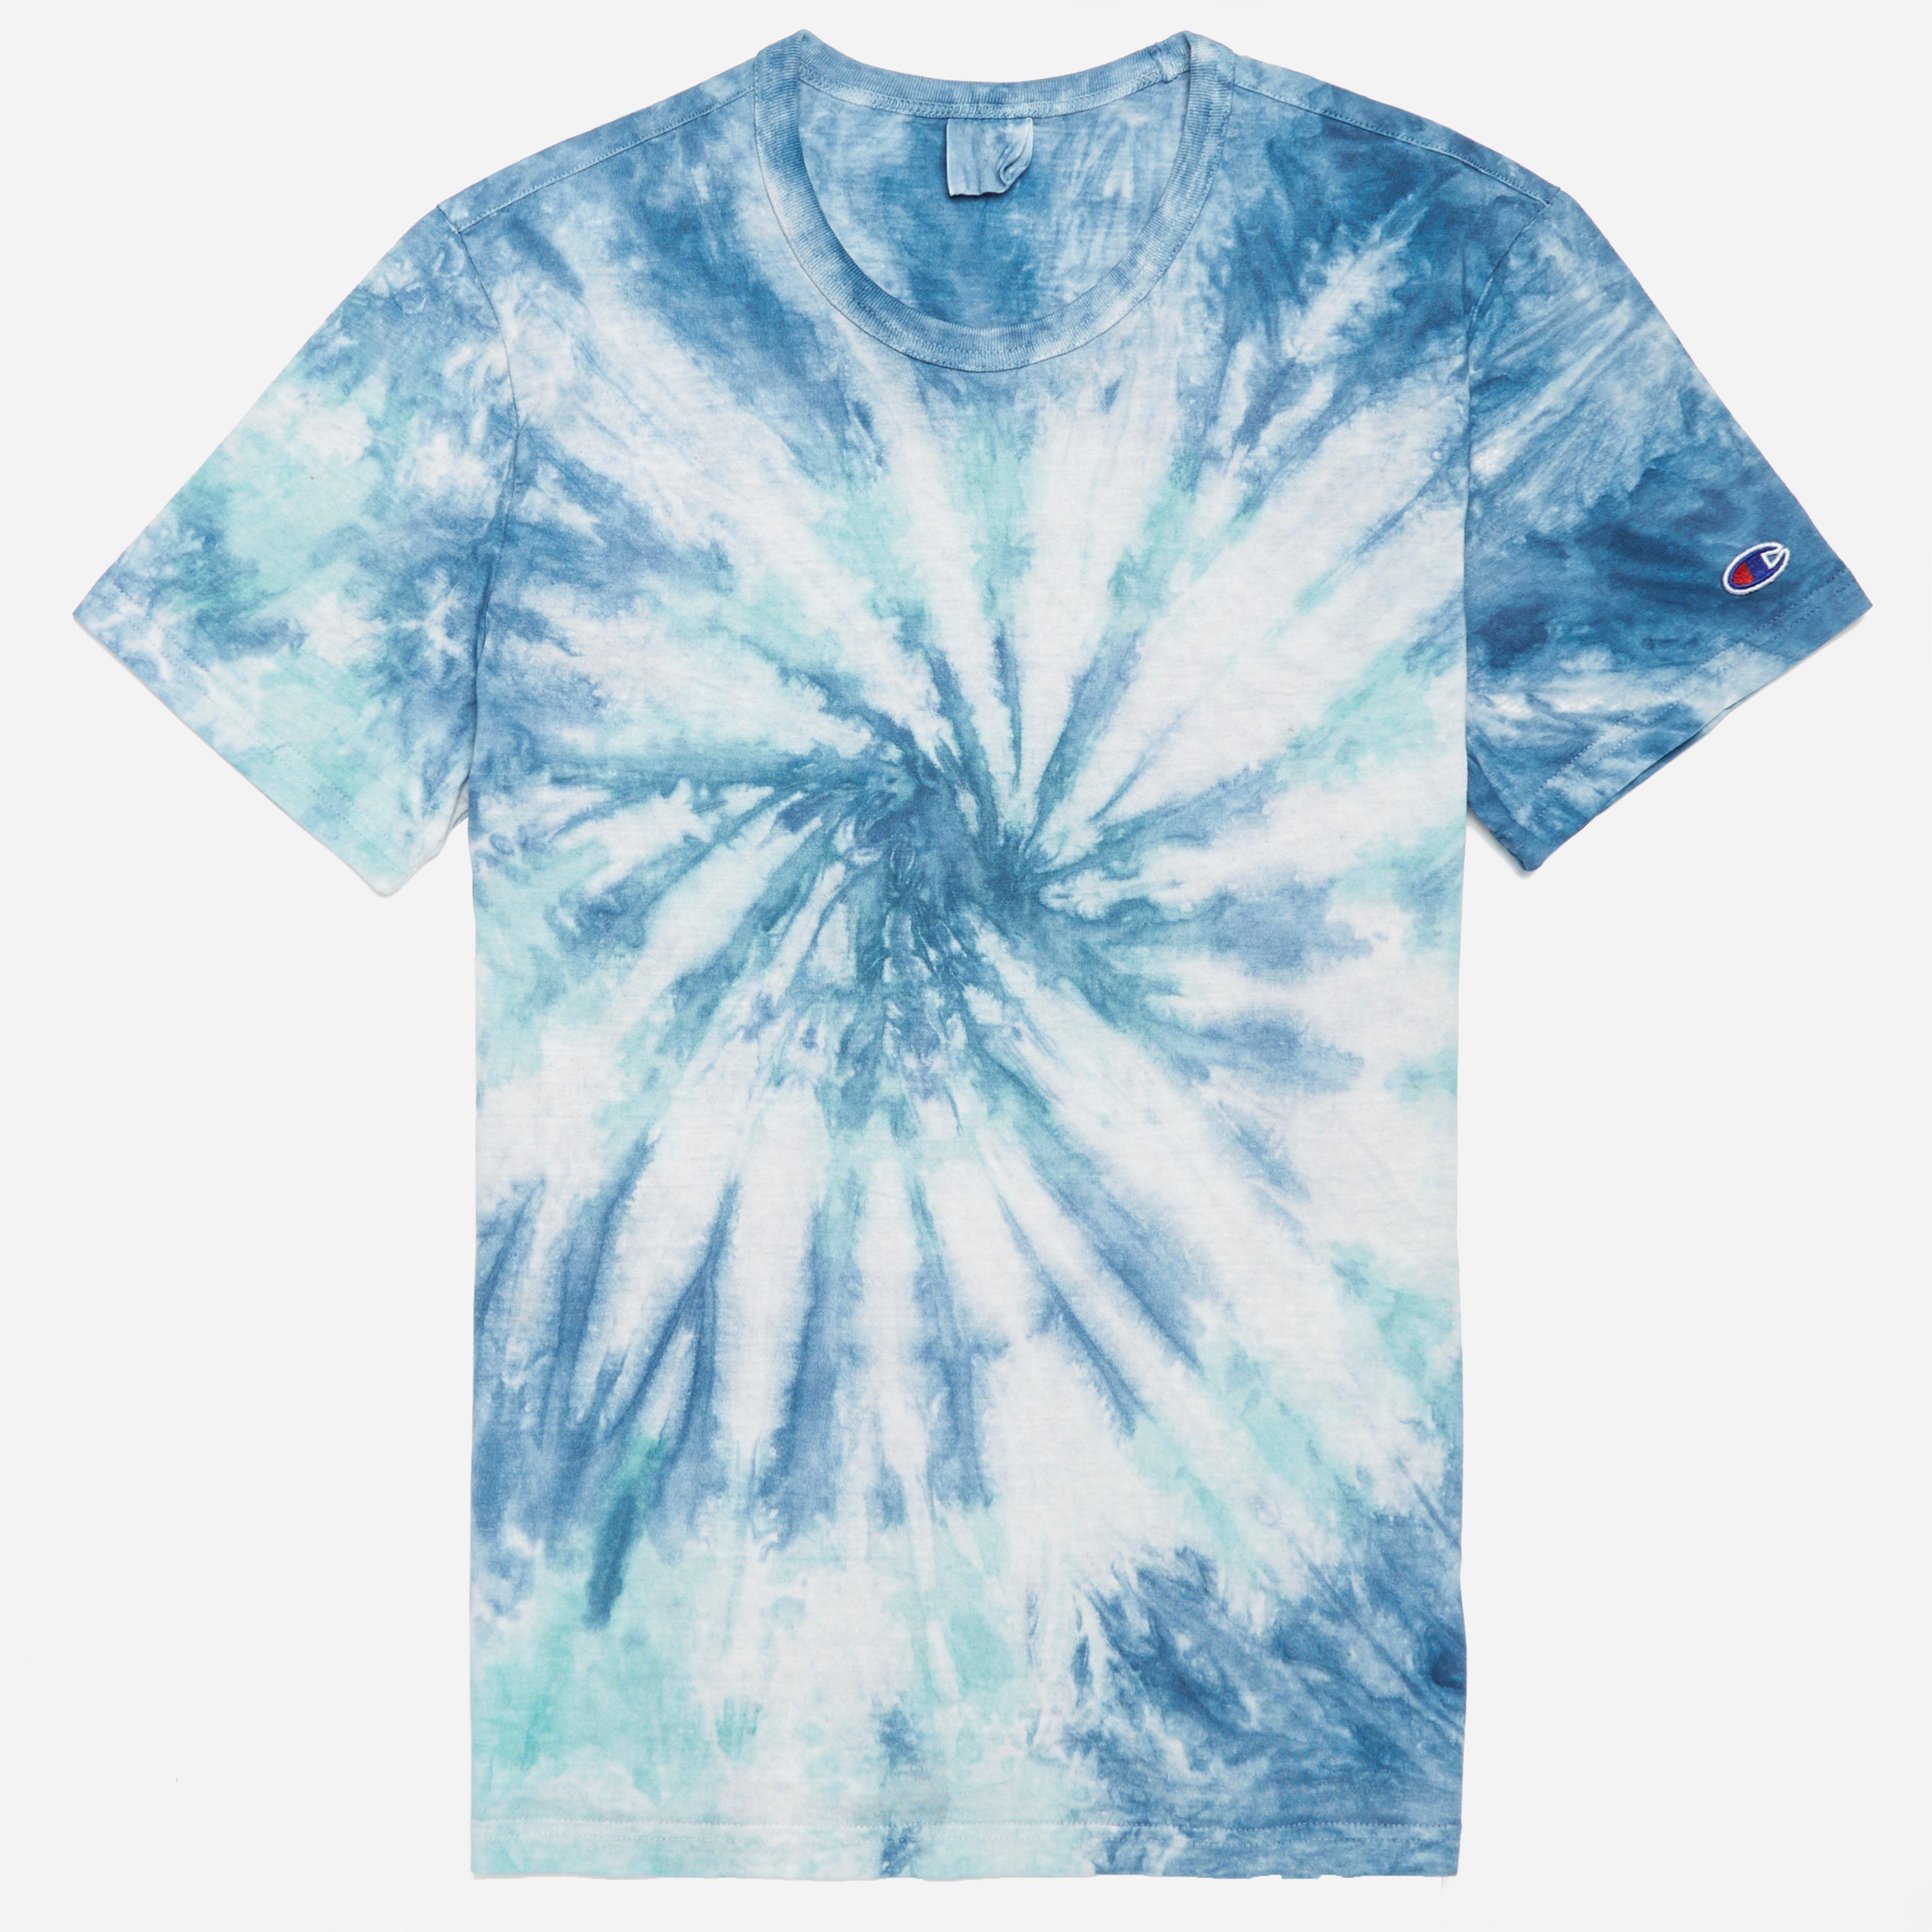 5f9df68ff0a5 Champion Crewneck Tie Dye T-shirt in Blue for Men - Lyst